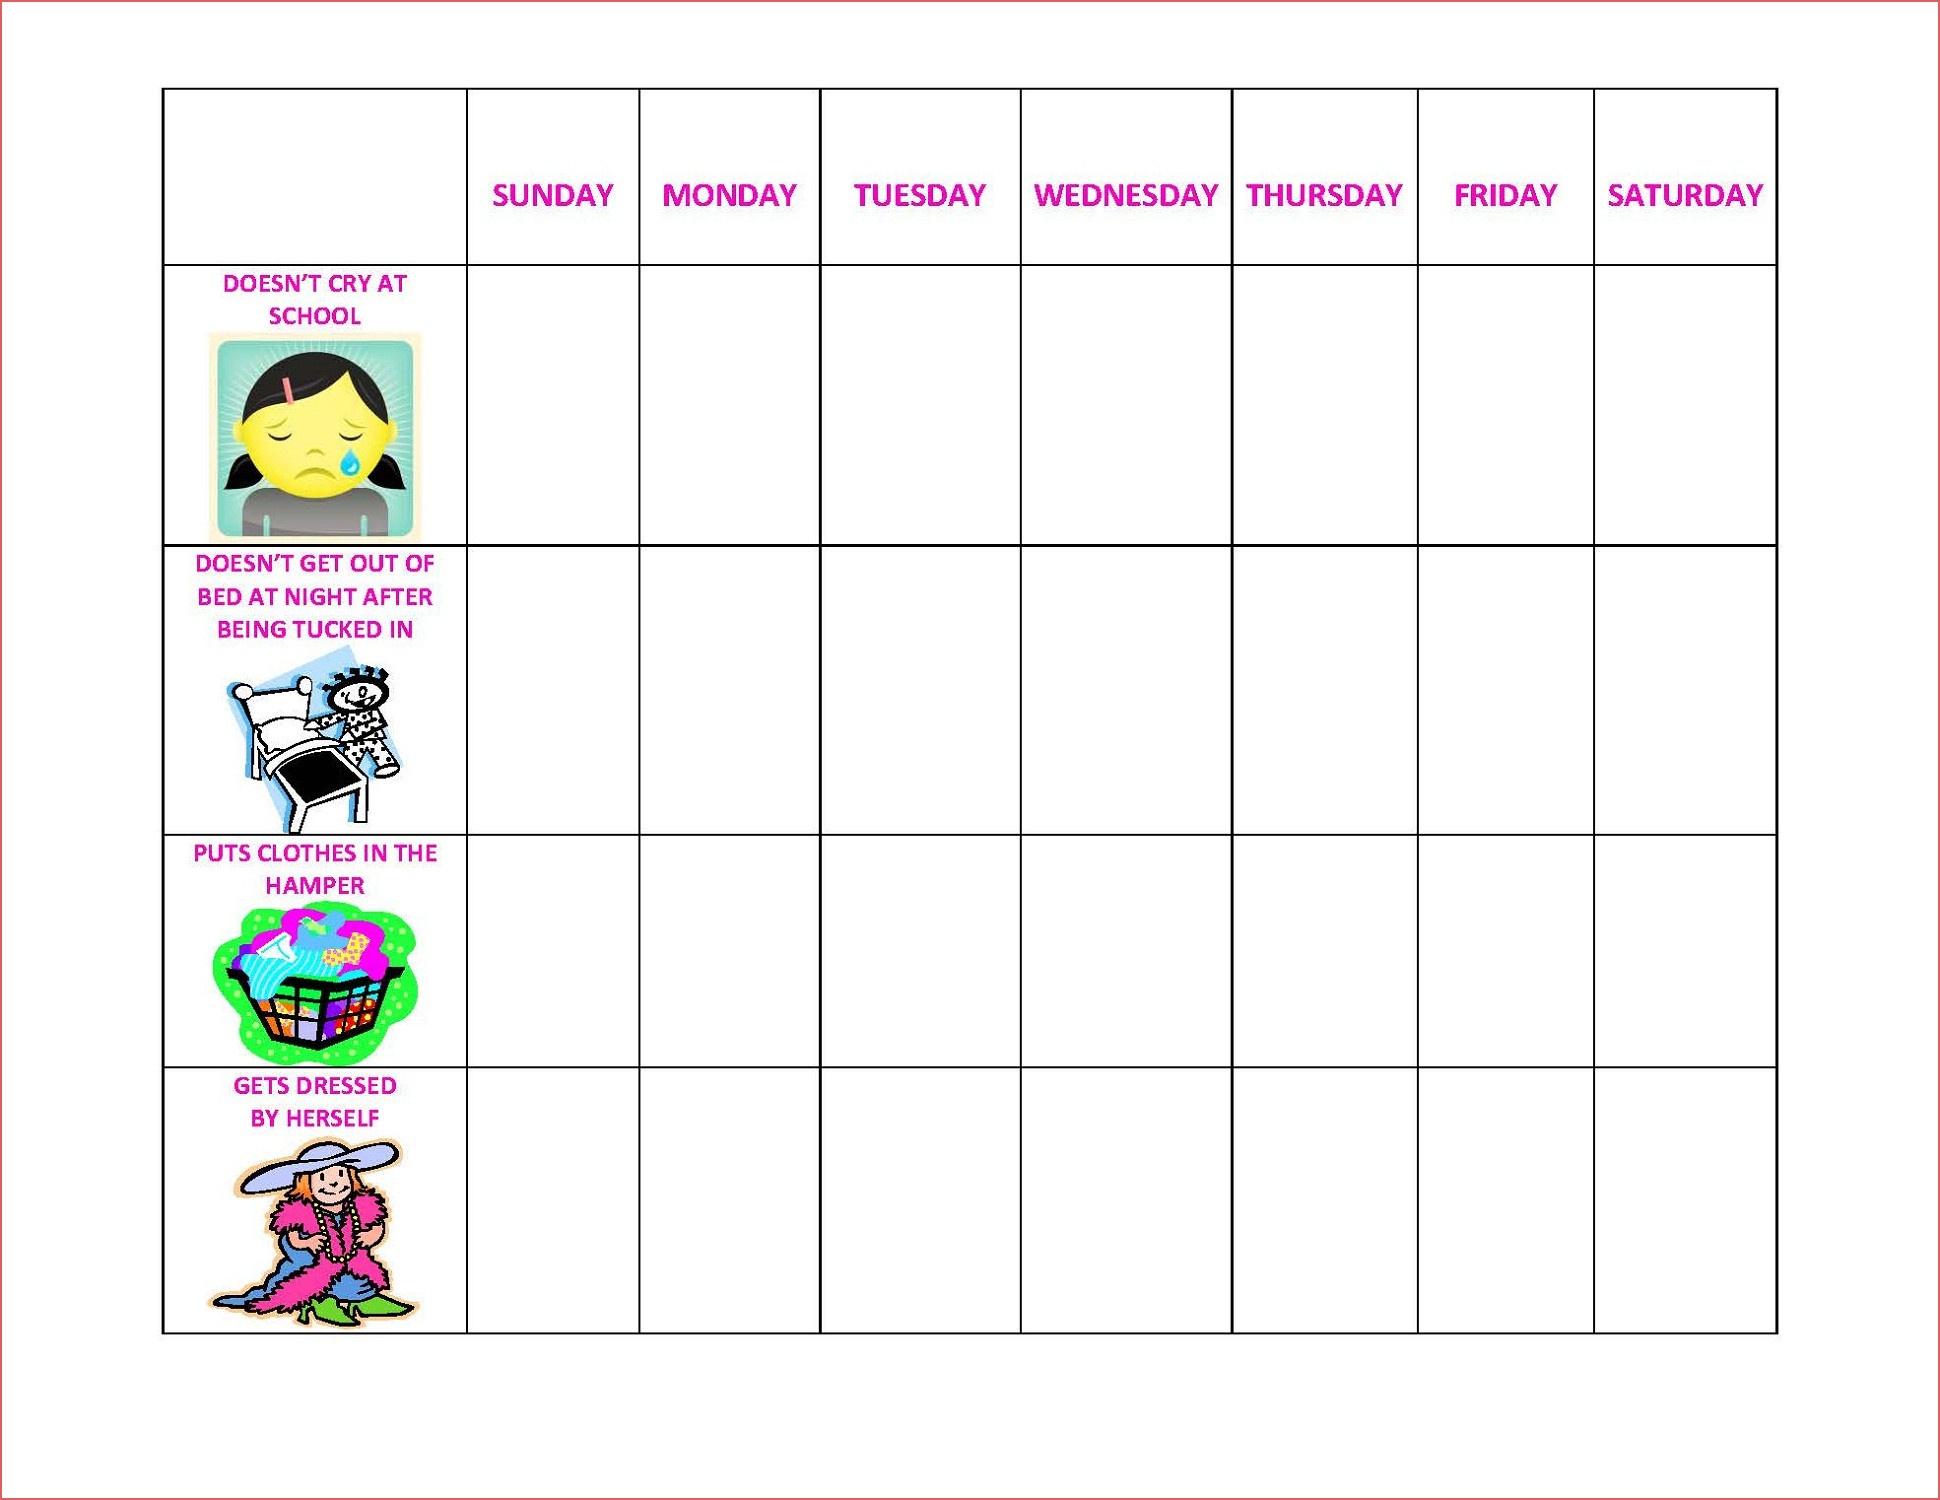 Printable Behavior Calendar Daily Printable Behavior Charts For Home - Free Printable Behaviour Charts For Home